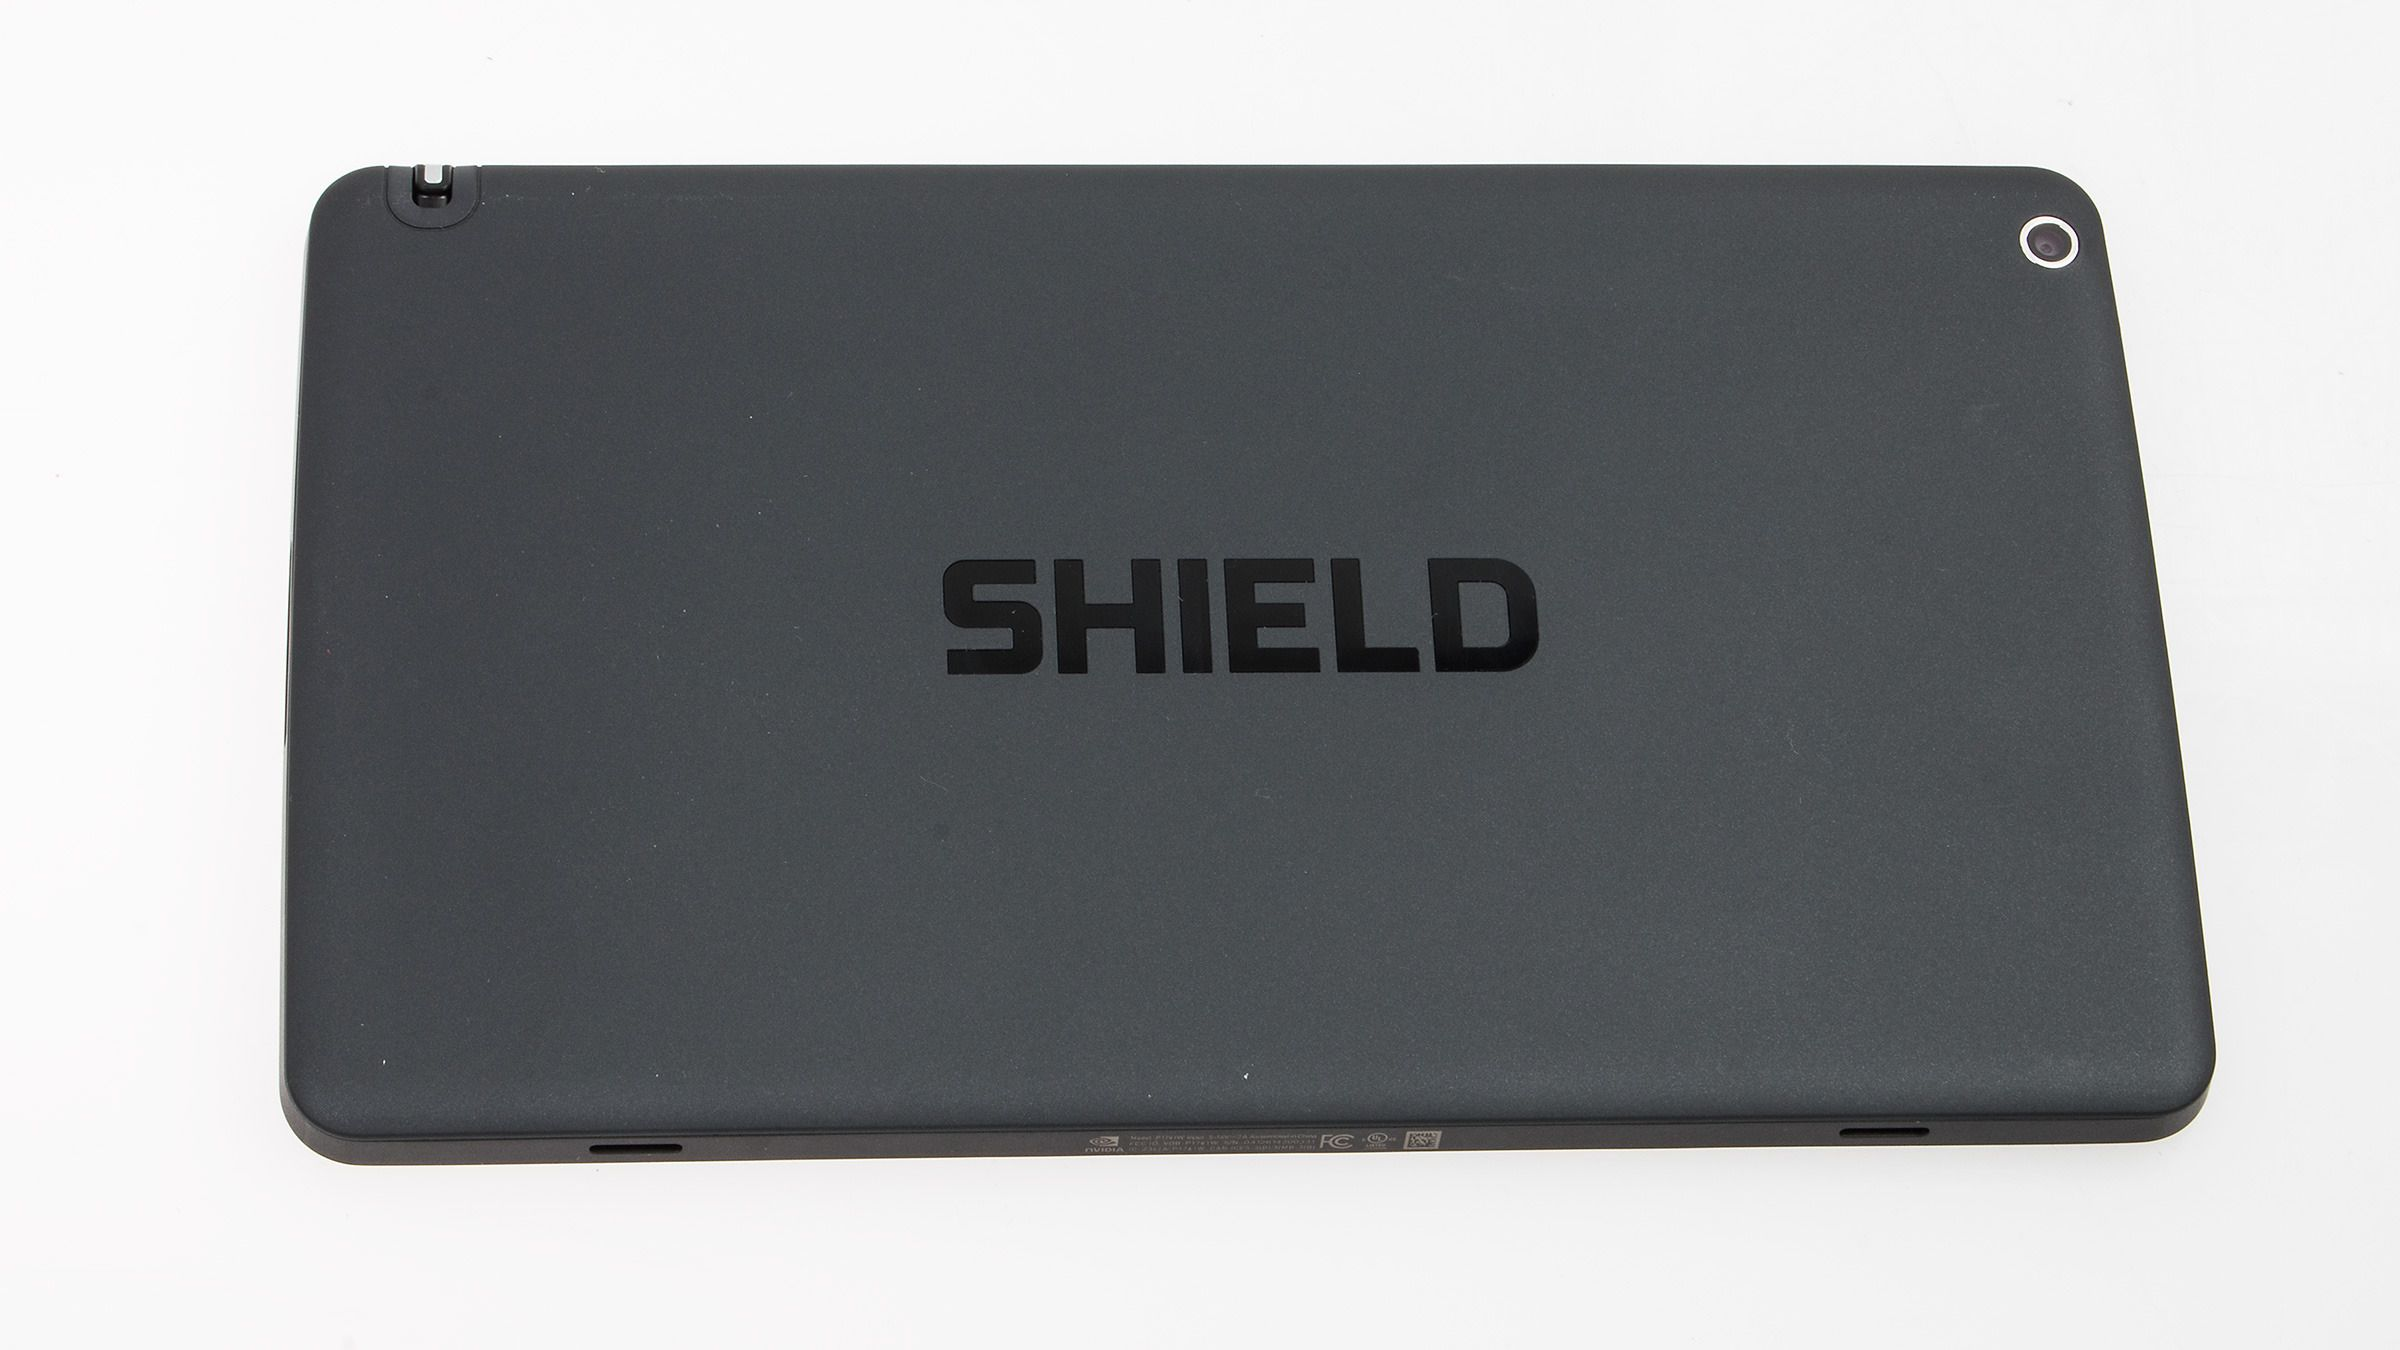 Nvidia Shield Tablet.Foto: Varg Aamo, Hardware.no